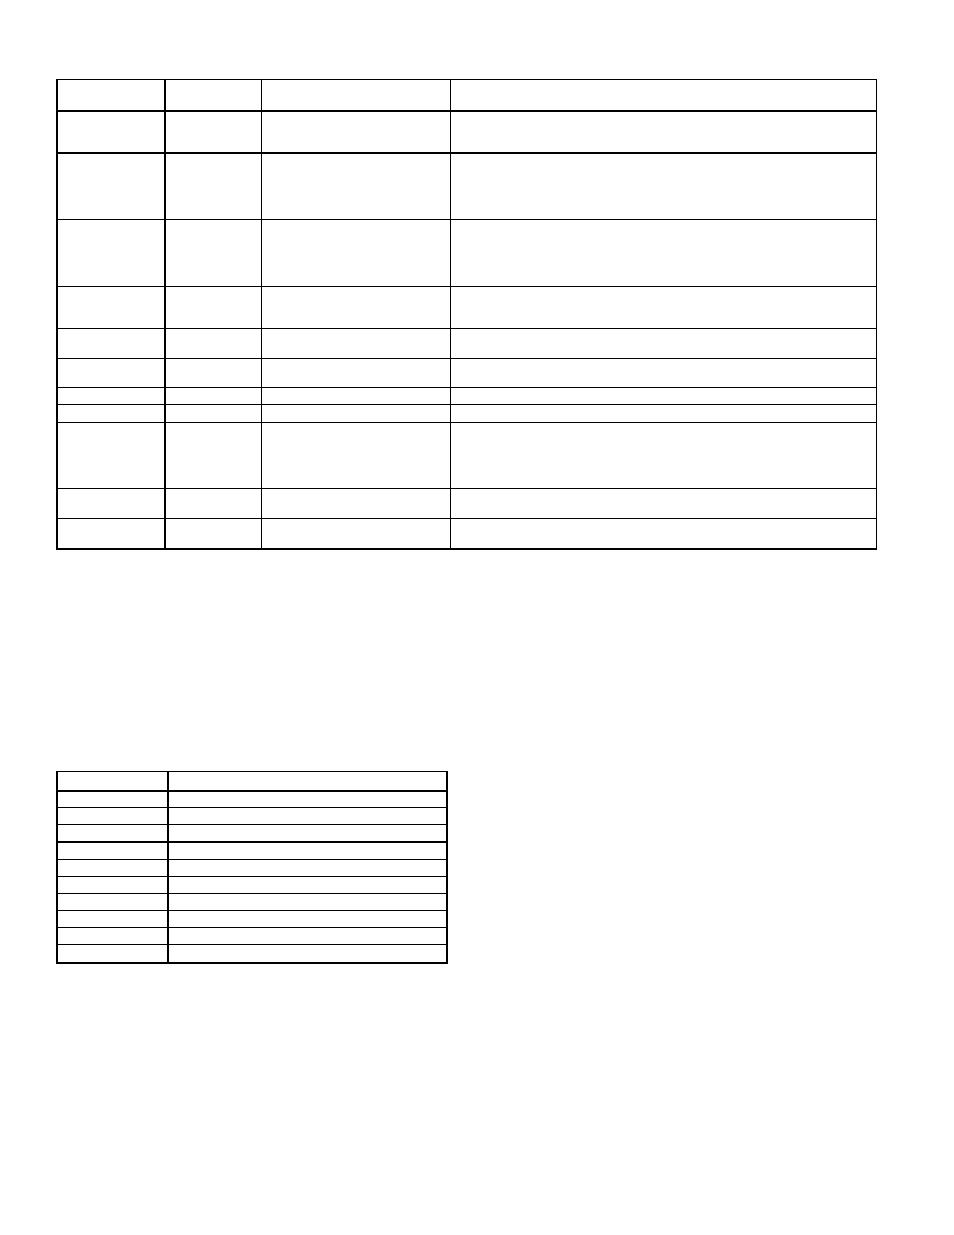 Induced Draft Motor Fault Impremedia Net